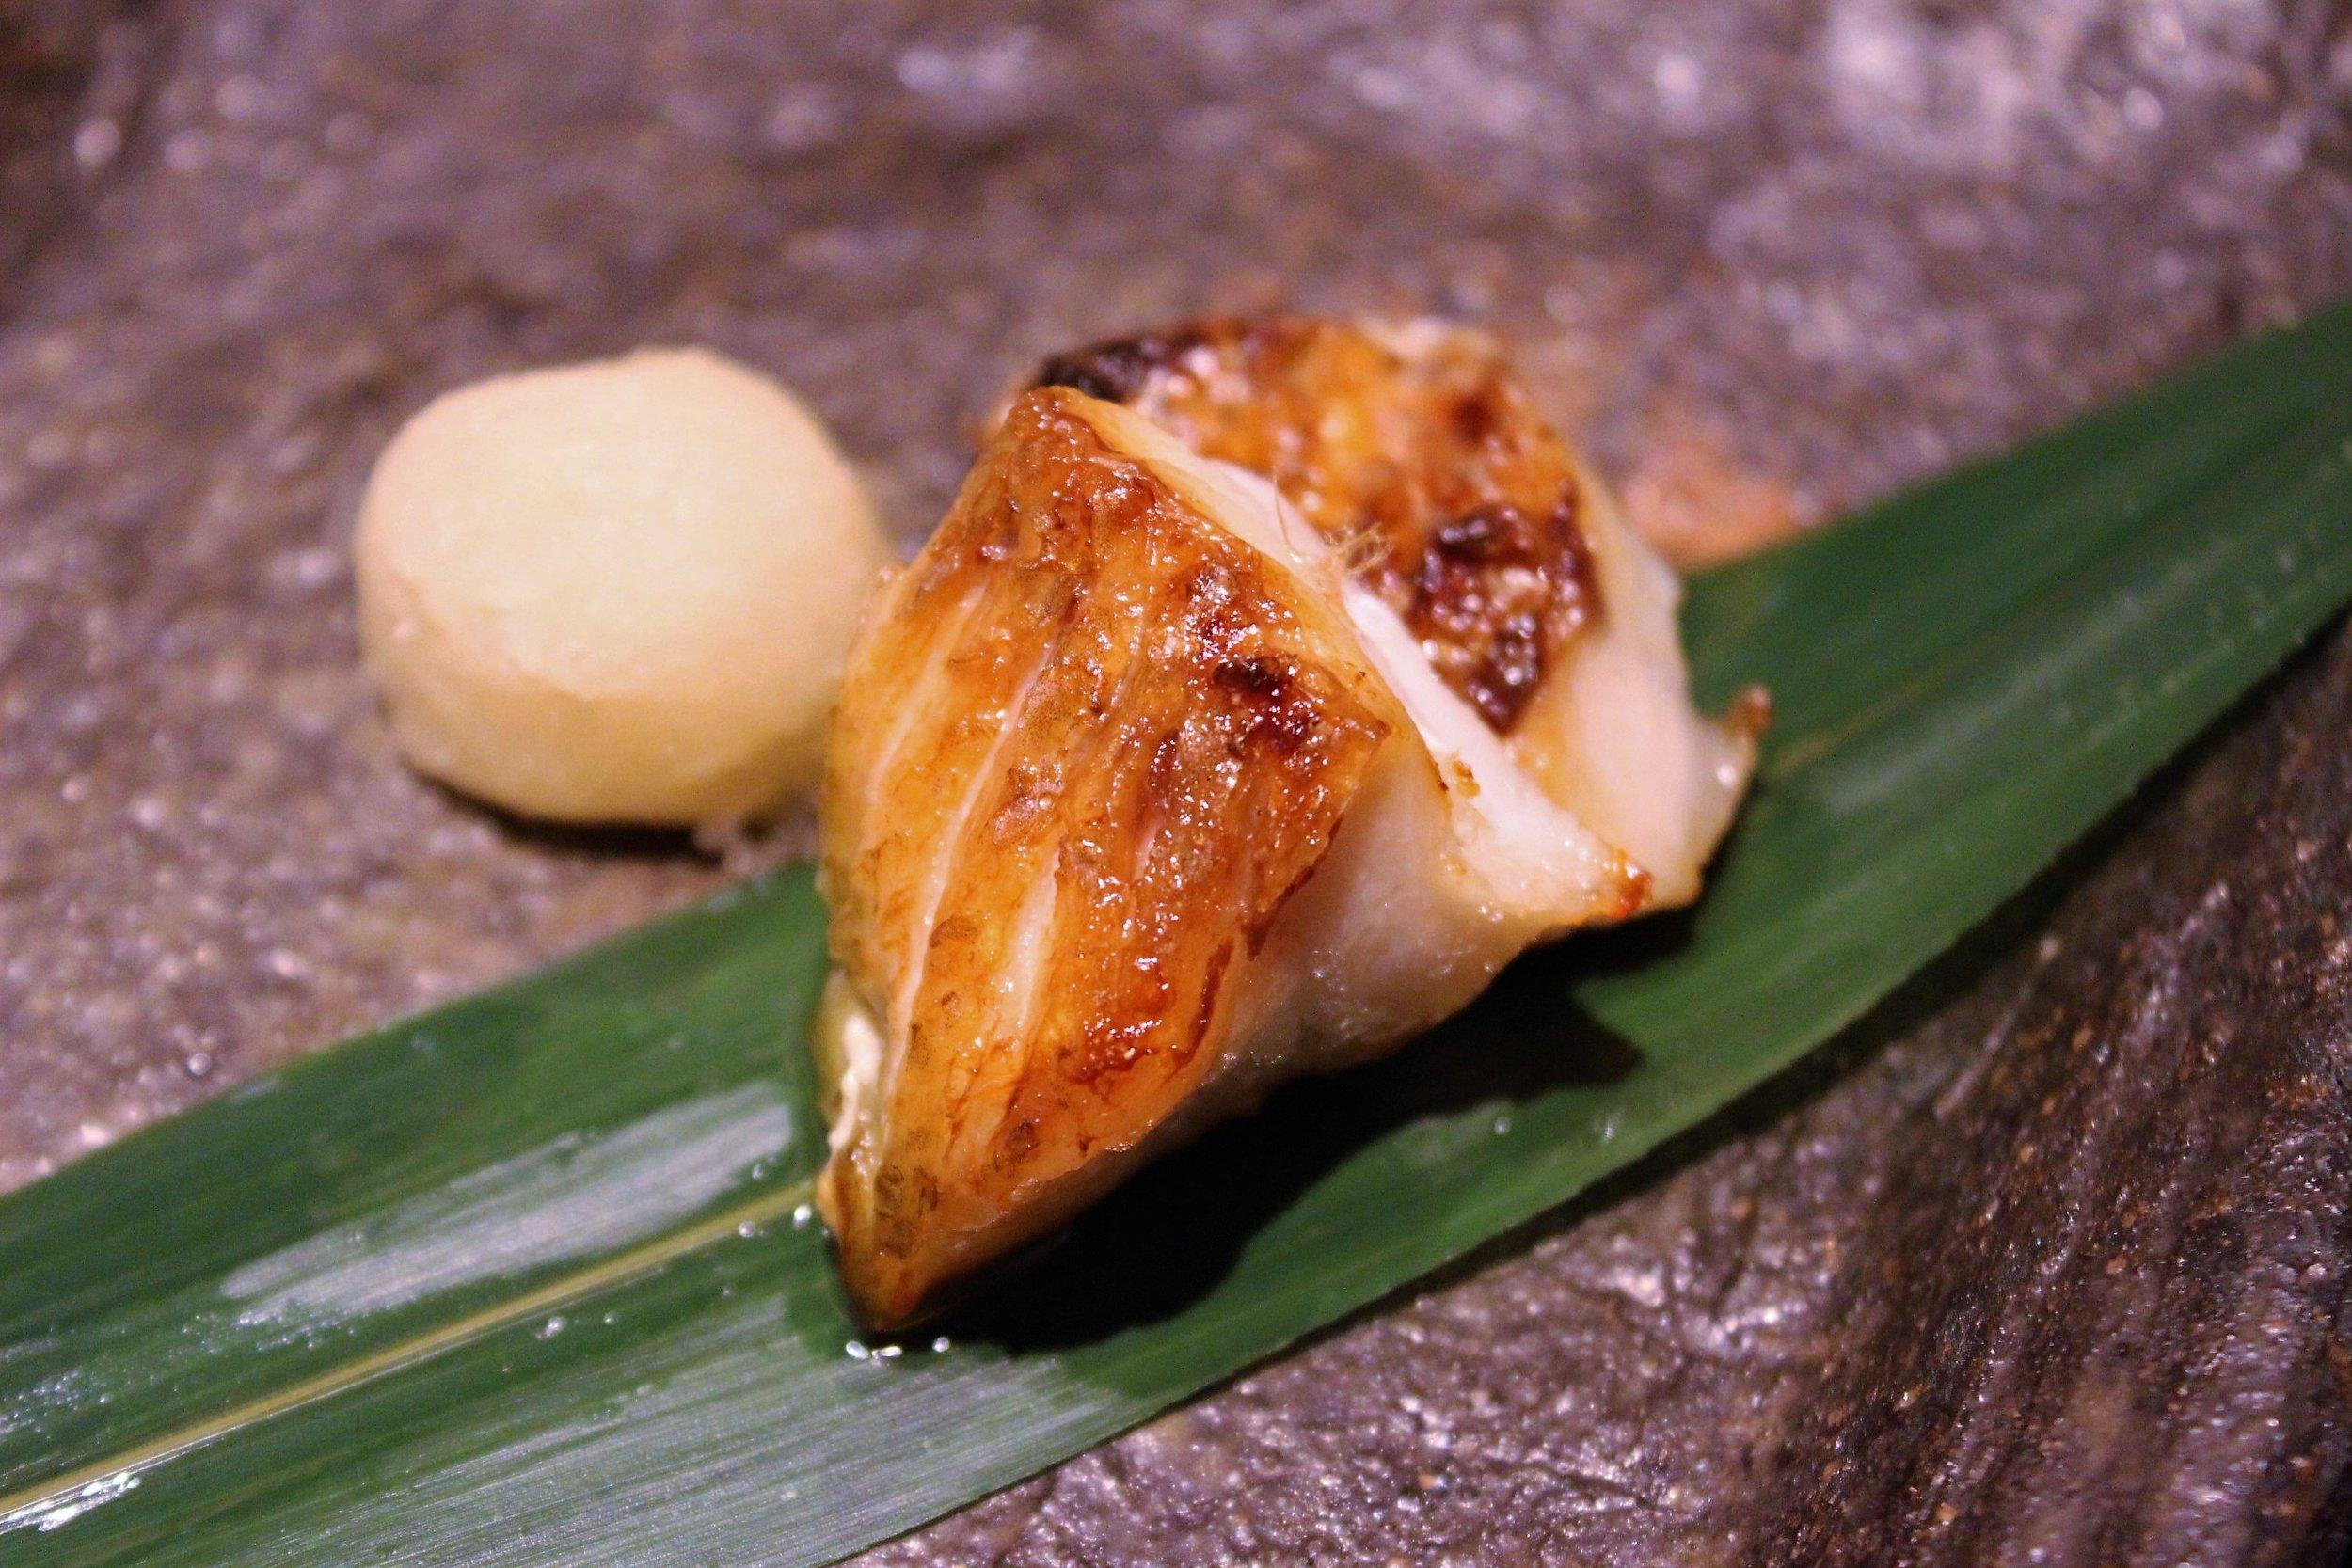 Grilled Nodoguro (Blackthroat Seaperch) at Kien in Tokyo, Japan